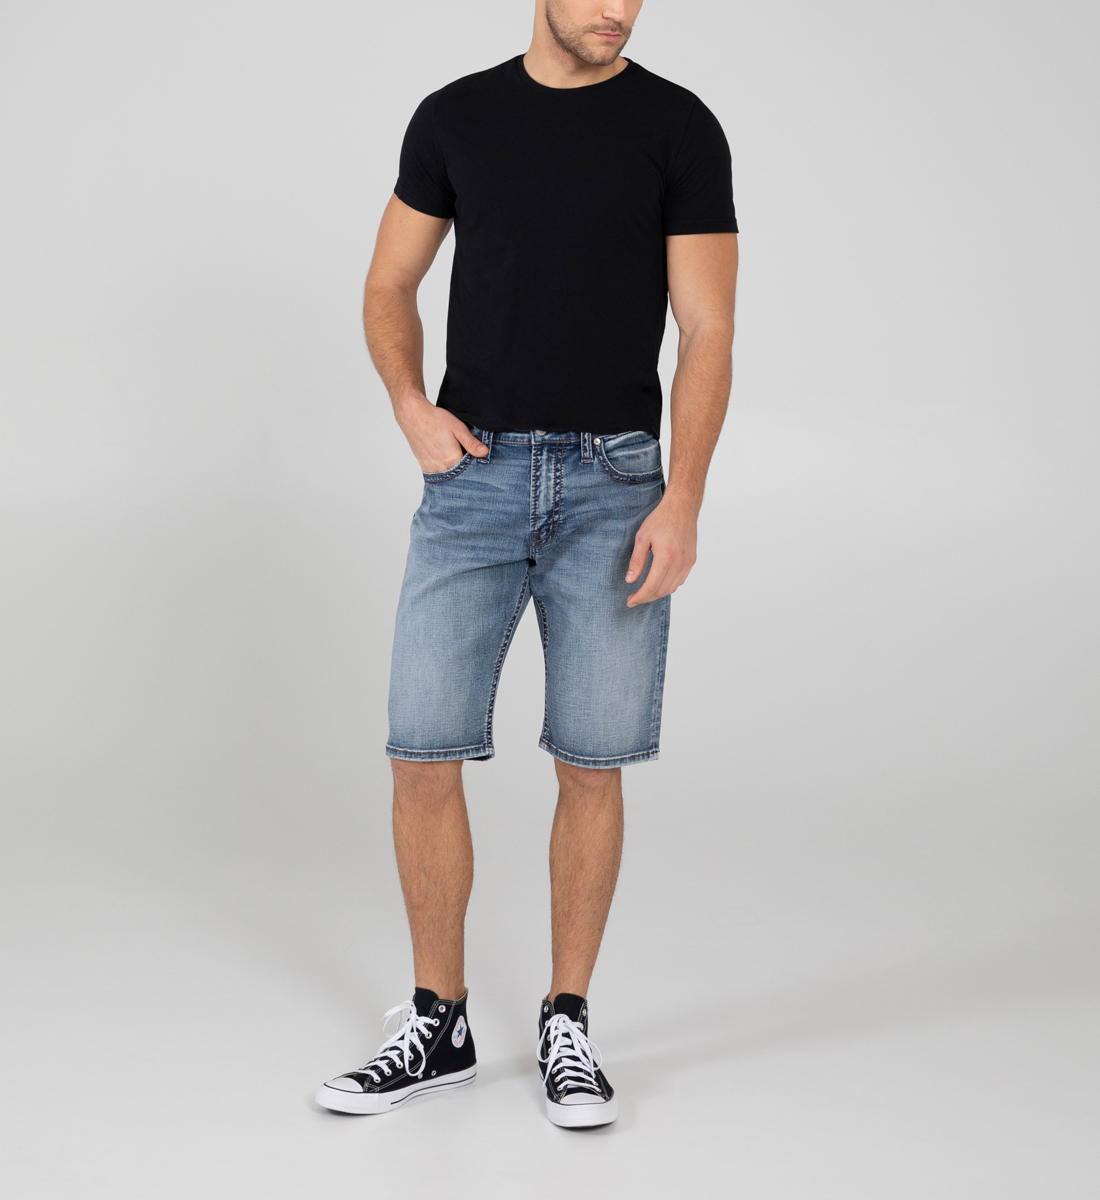 Silver Jeans Gordie Loose Fit Shorts